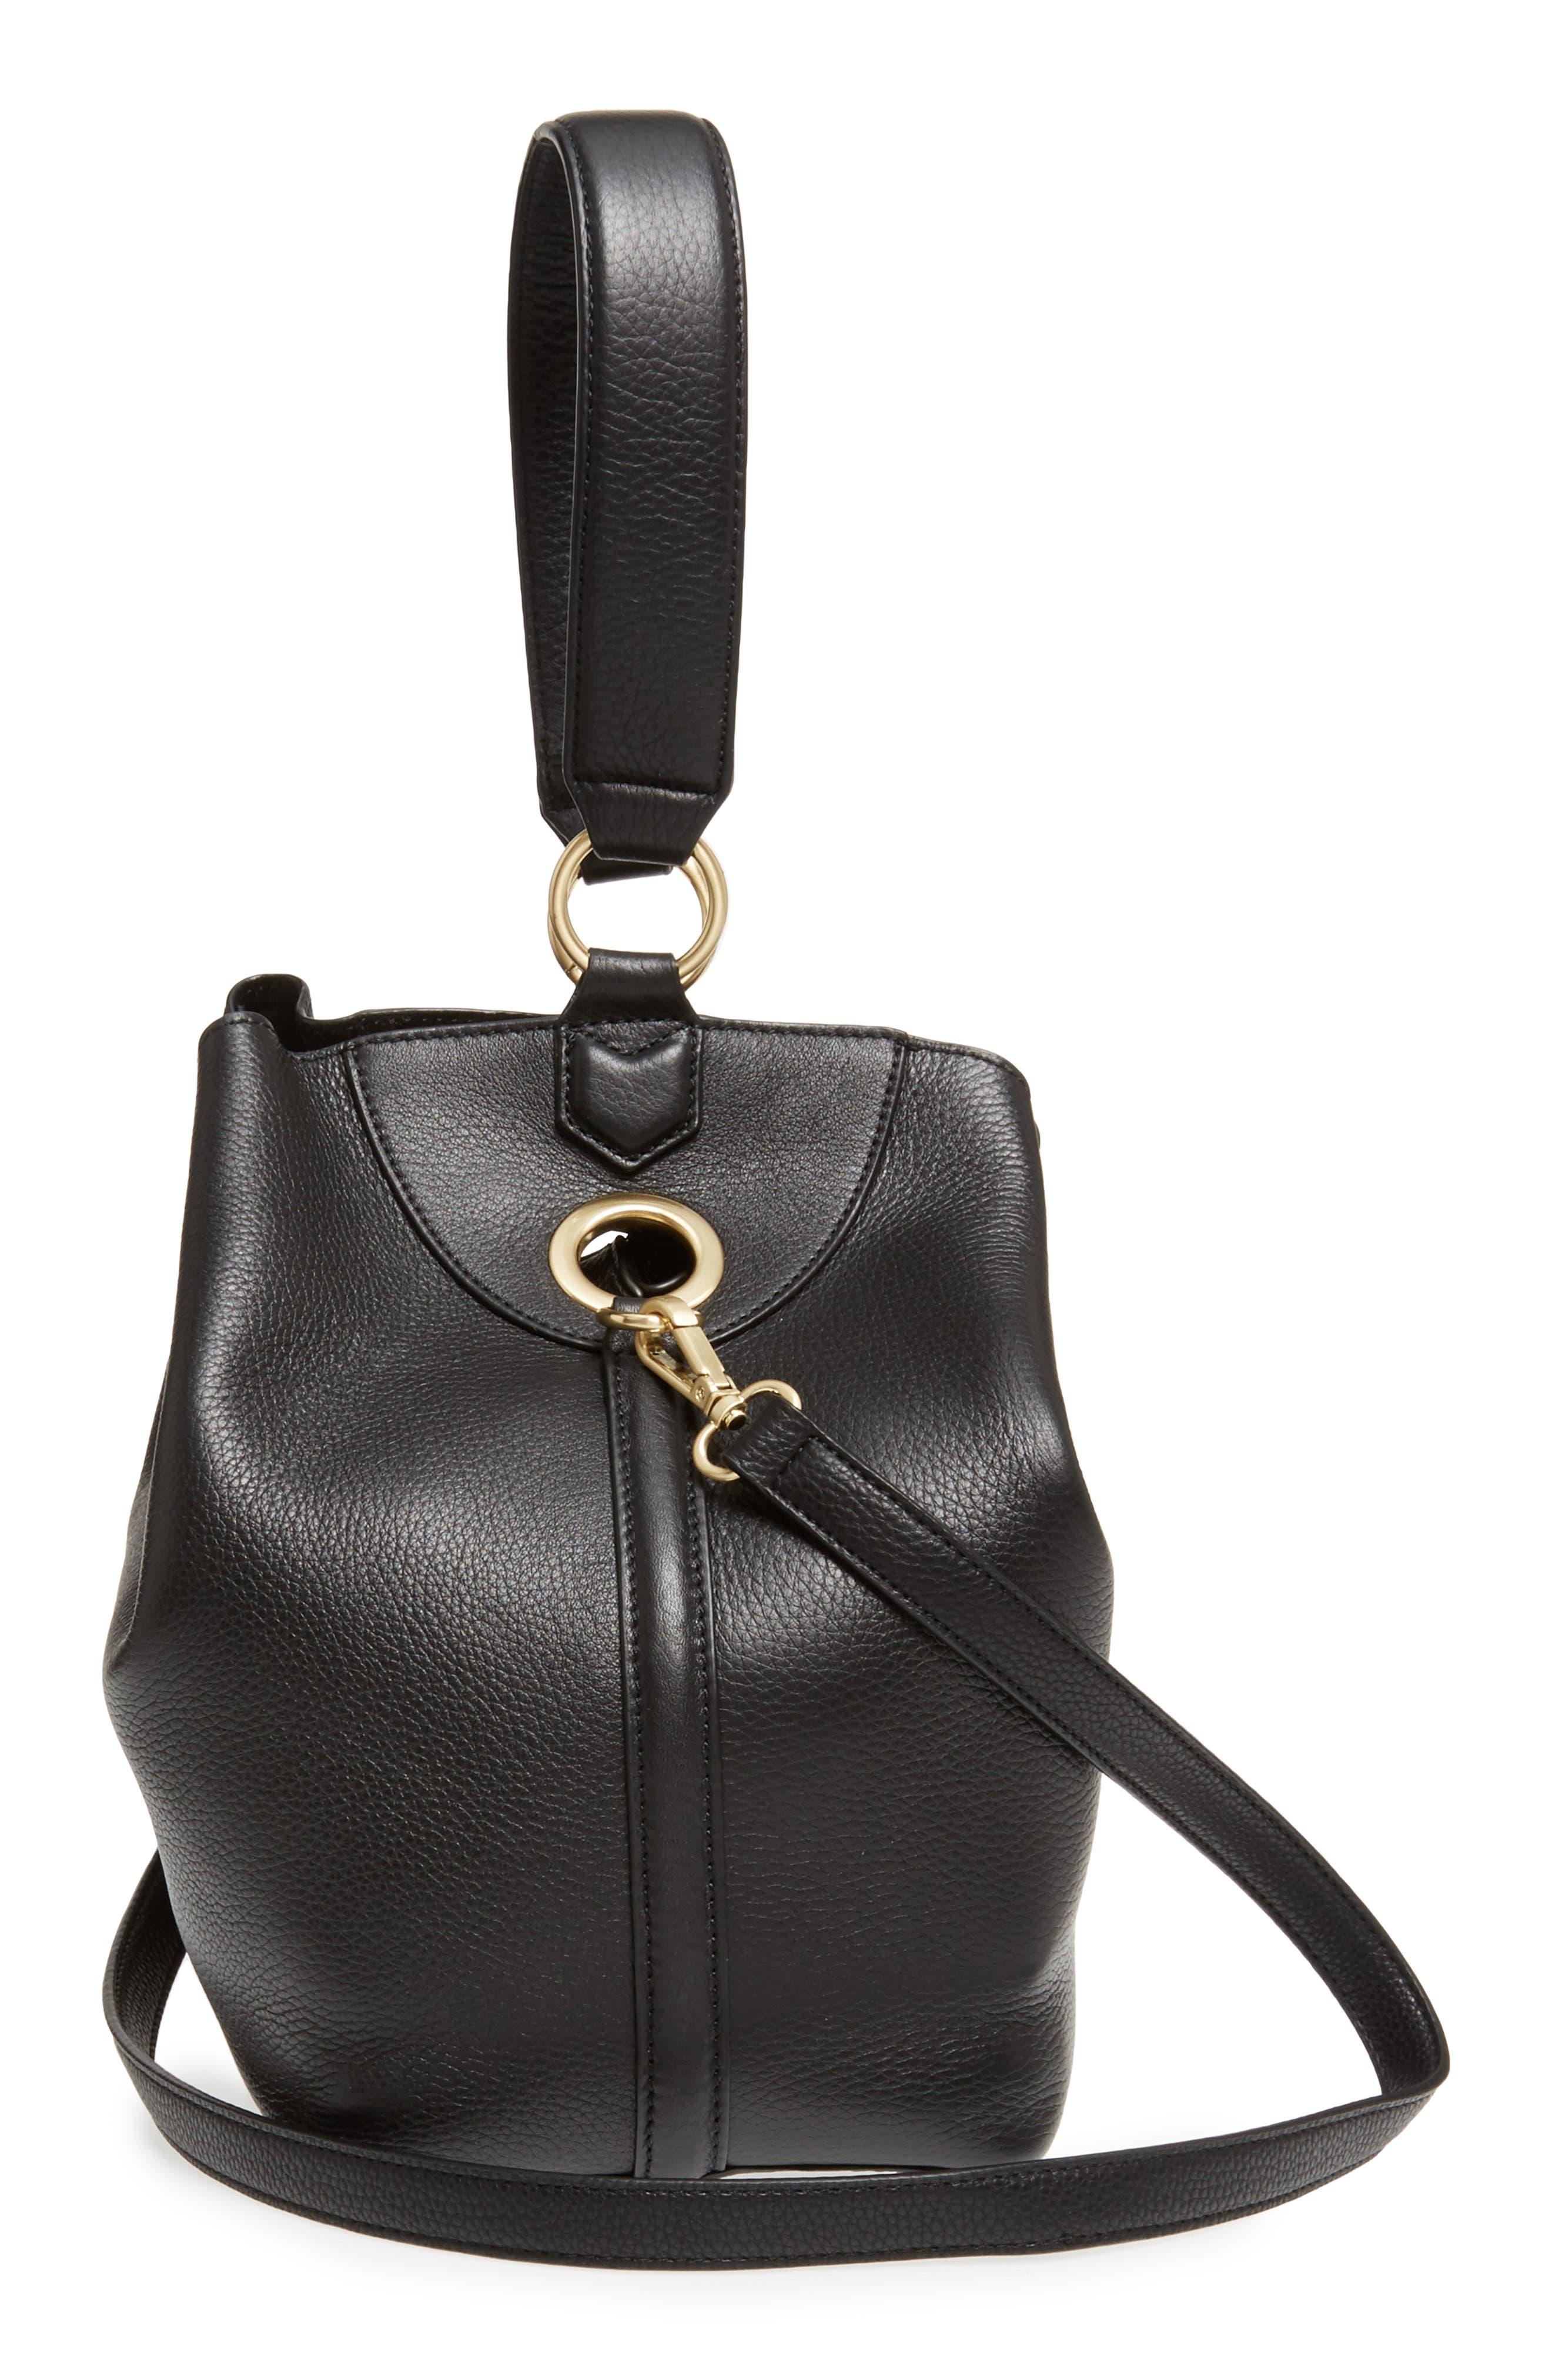 Alternate Image 1 Selected - Sam Edelman Renee Leather Bucket Bag